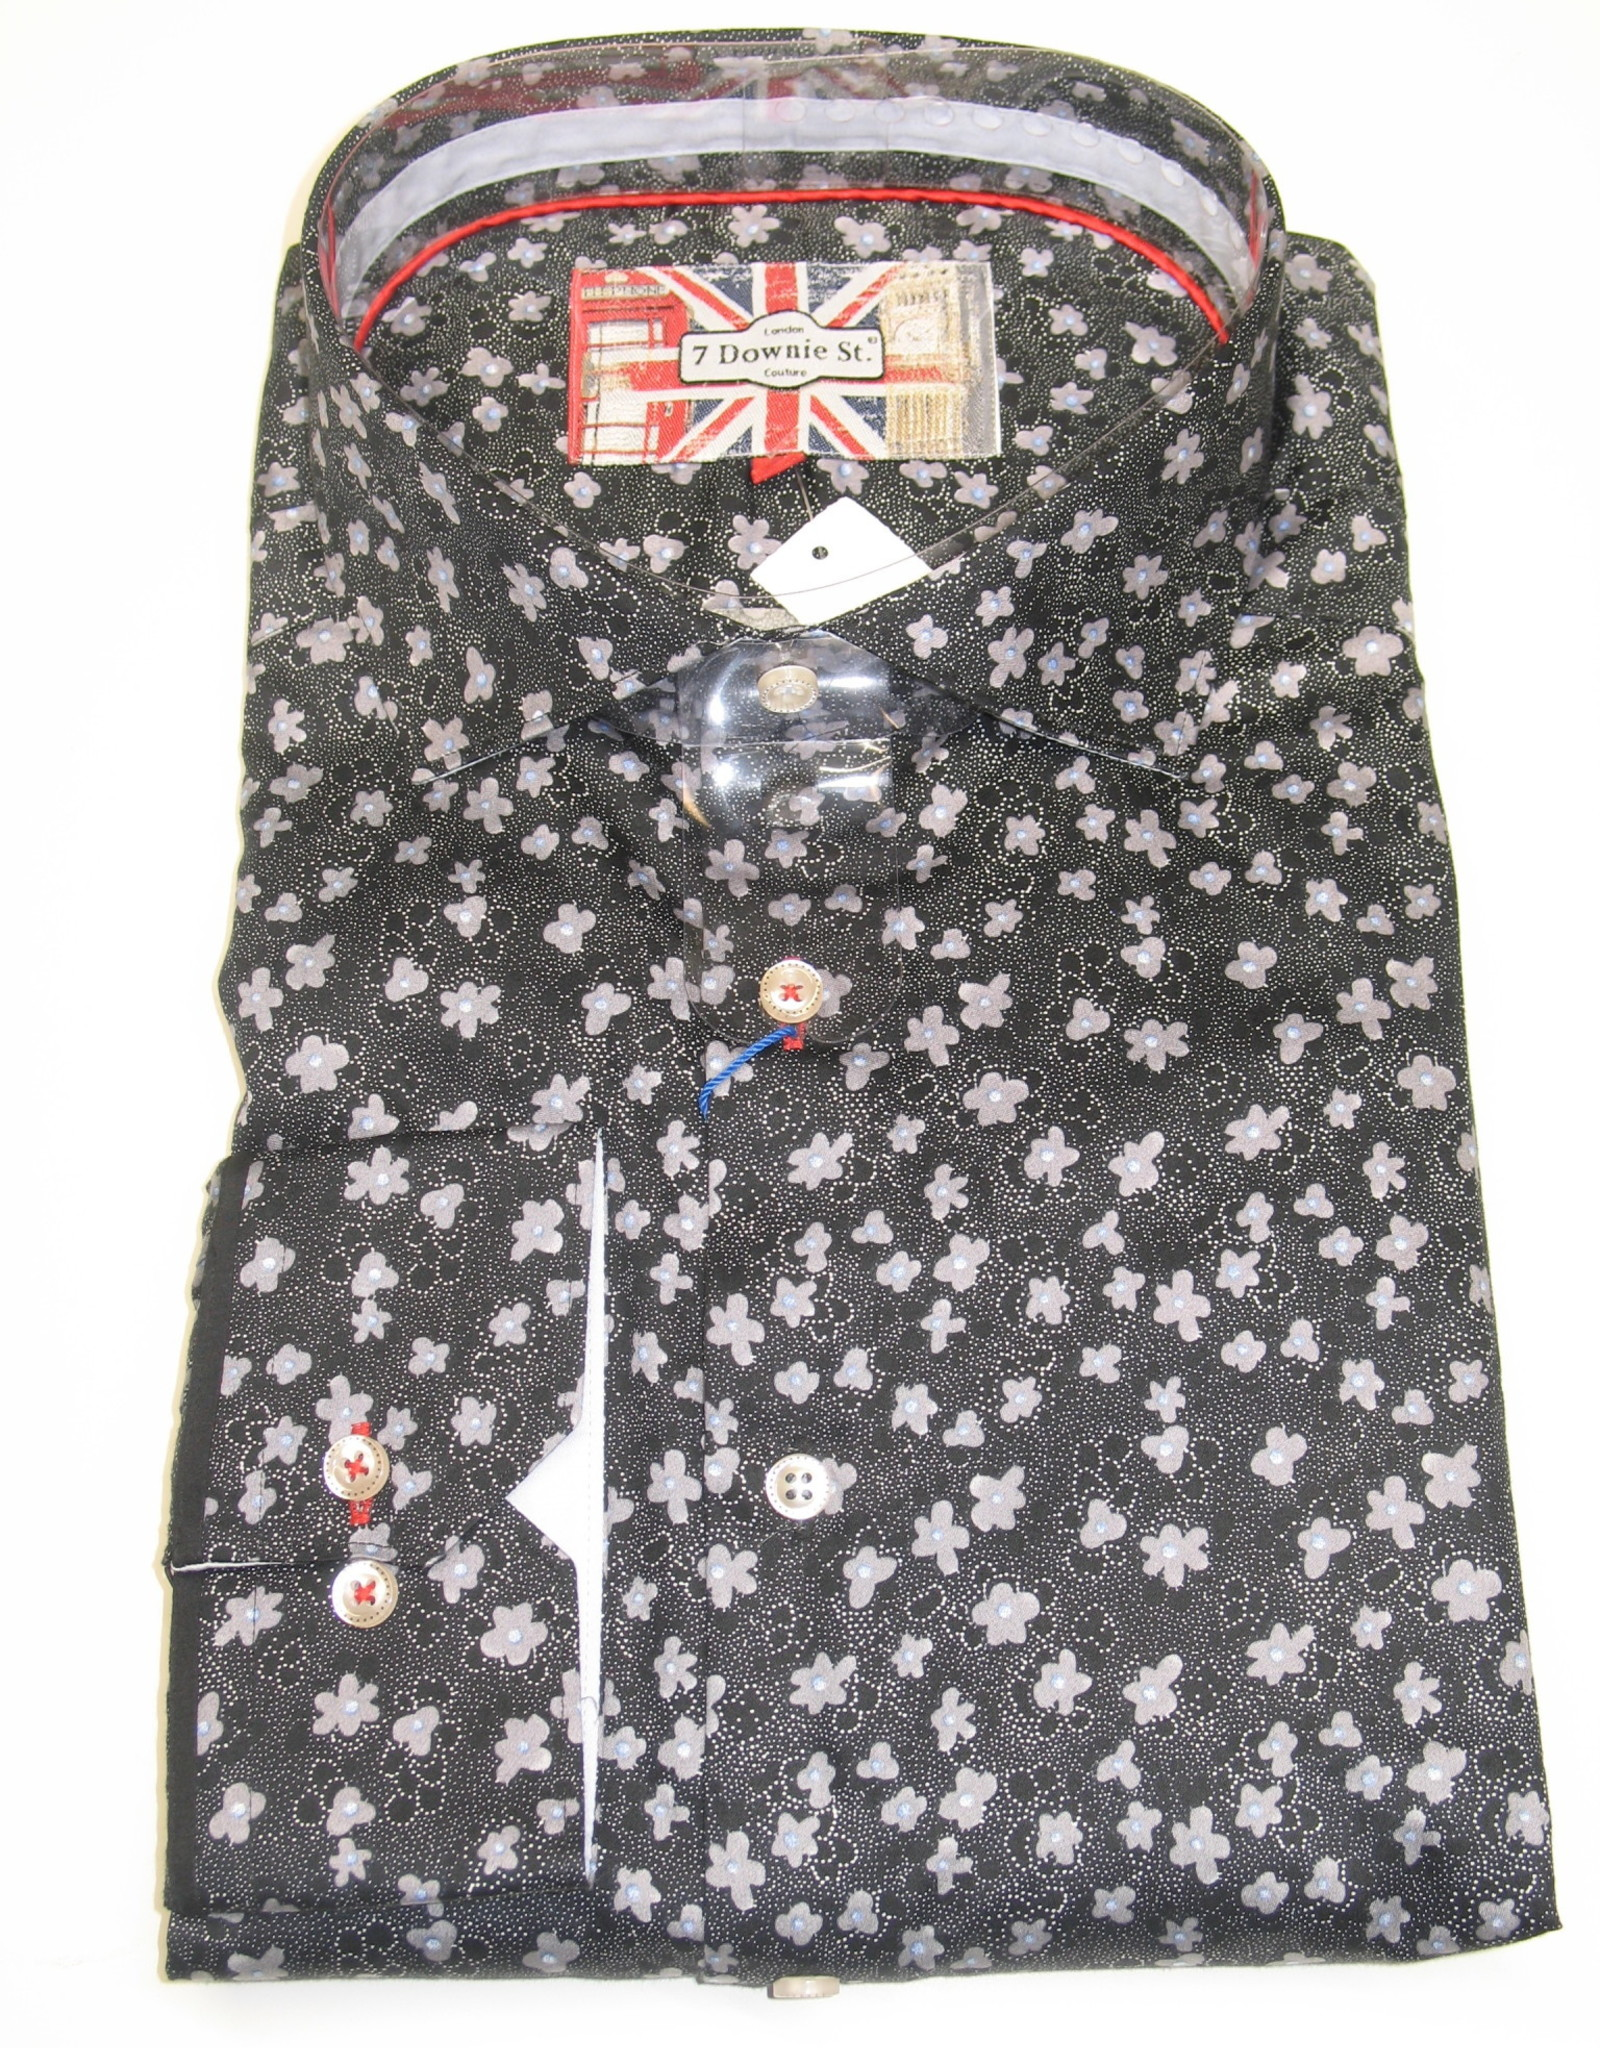 EROS FLORENCE Sport Shirt LS Size 9